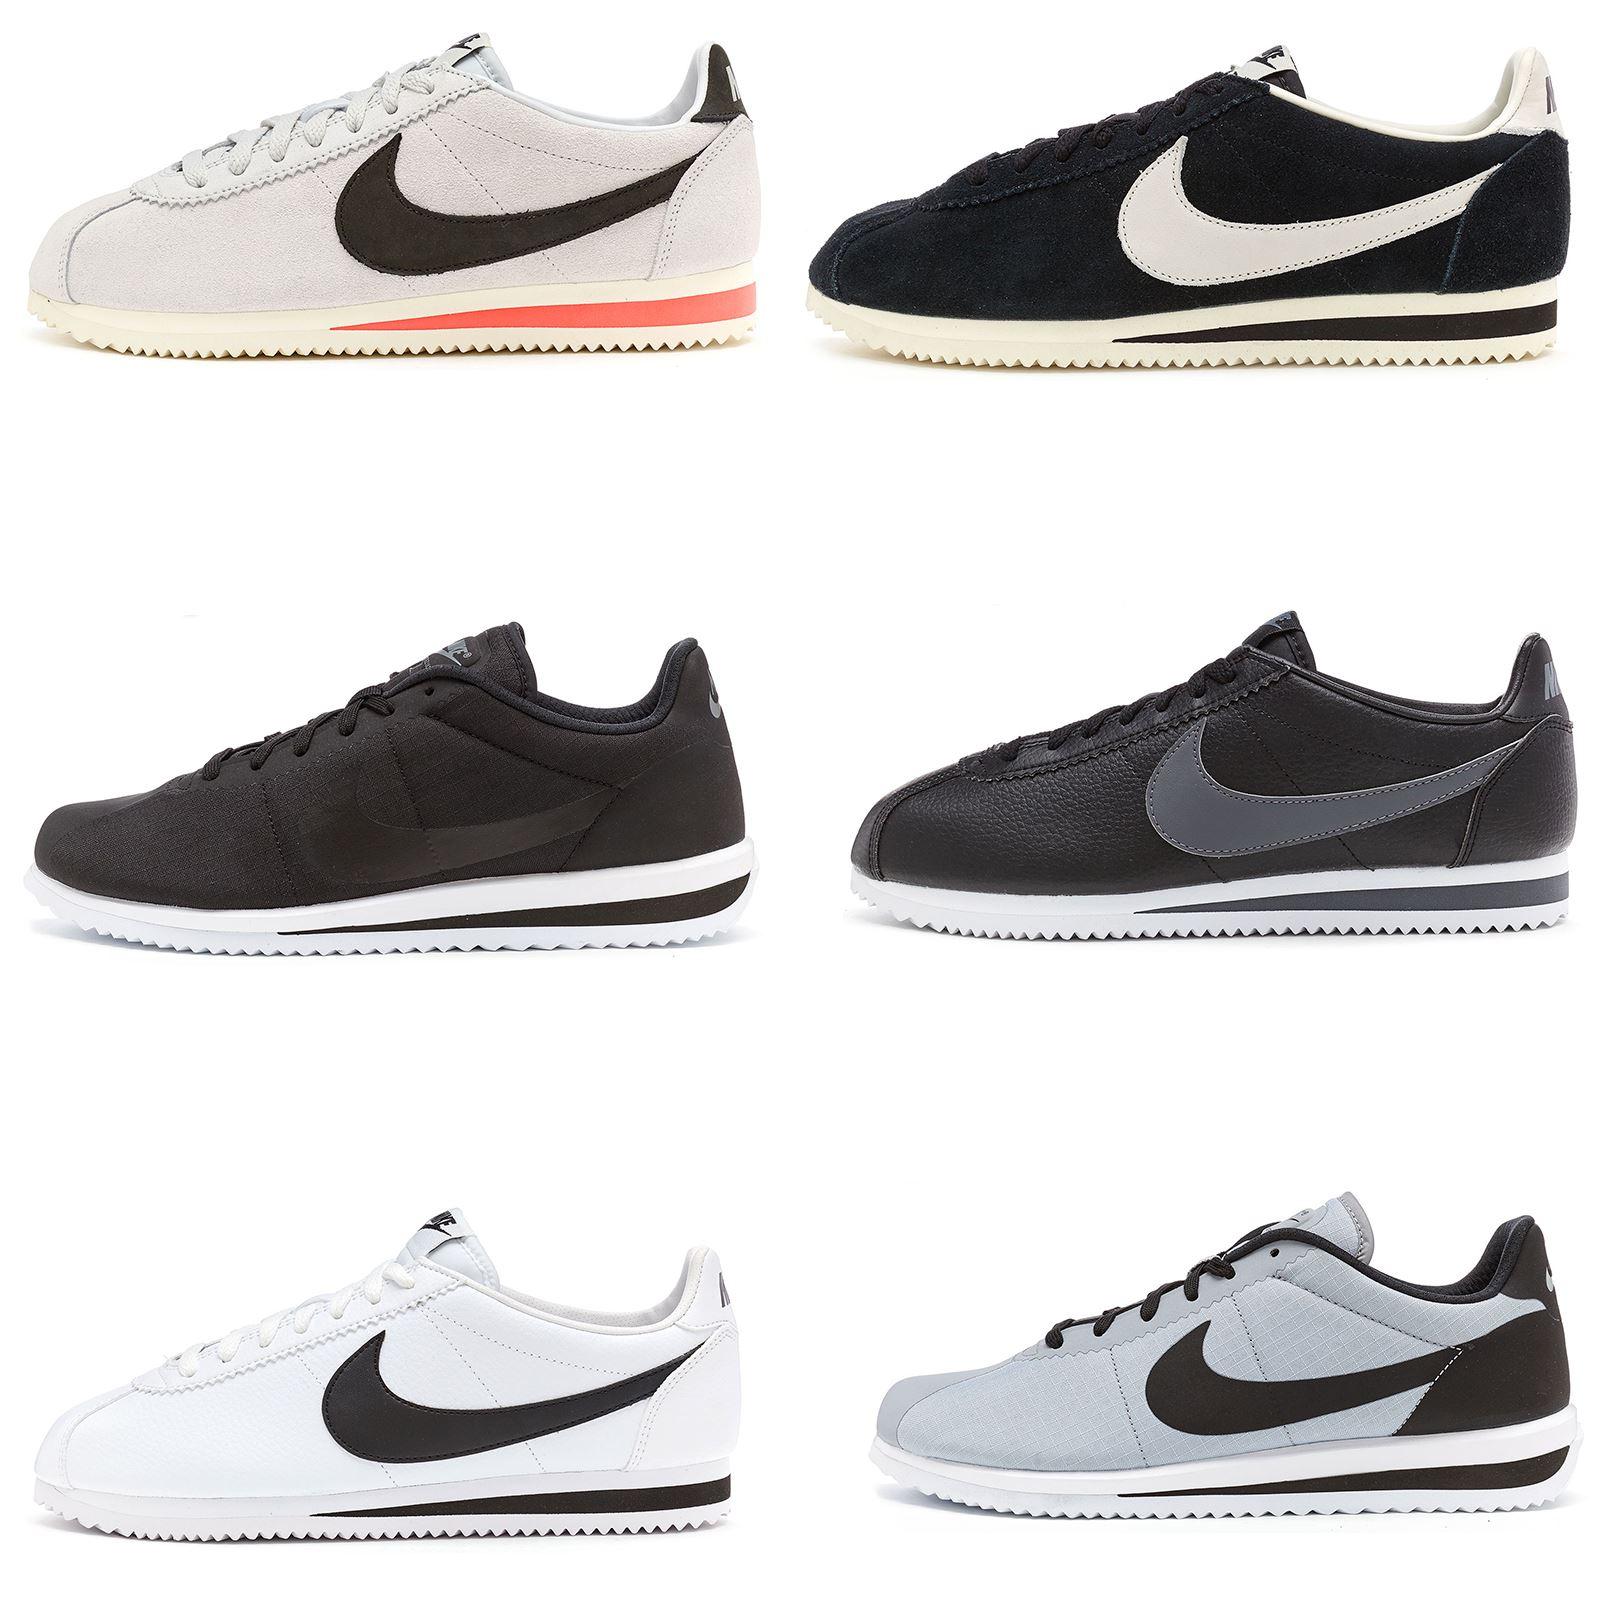 866cb59add1 Nike Classique Cortez   Ultra Raiders   Cuir Soi Treiners Noir